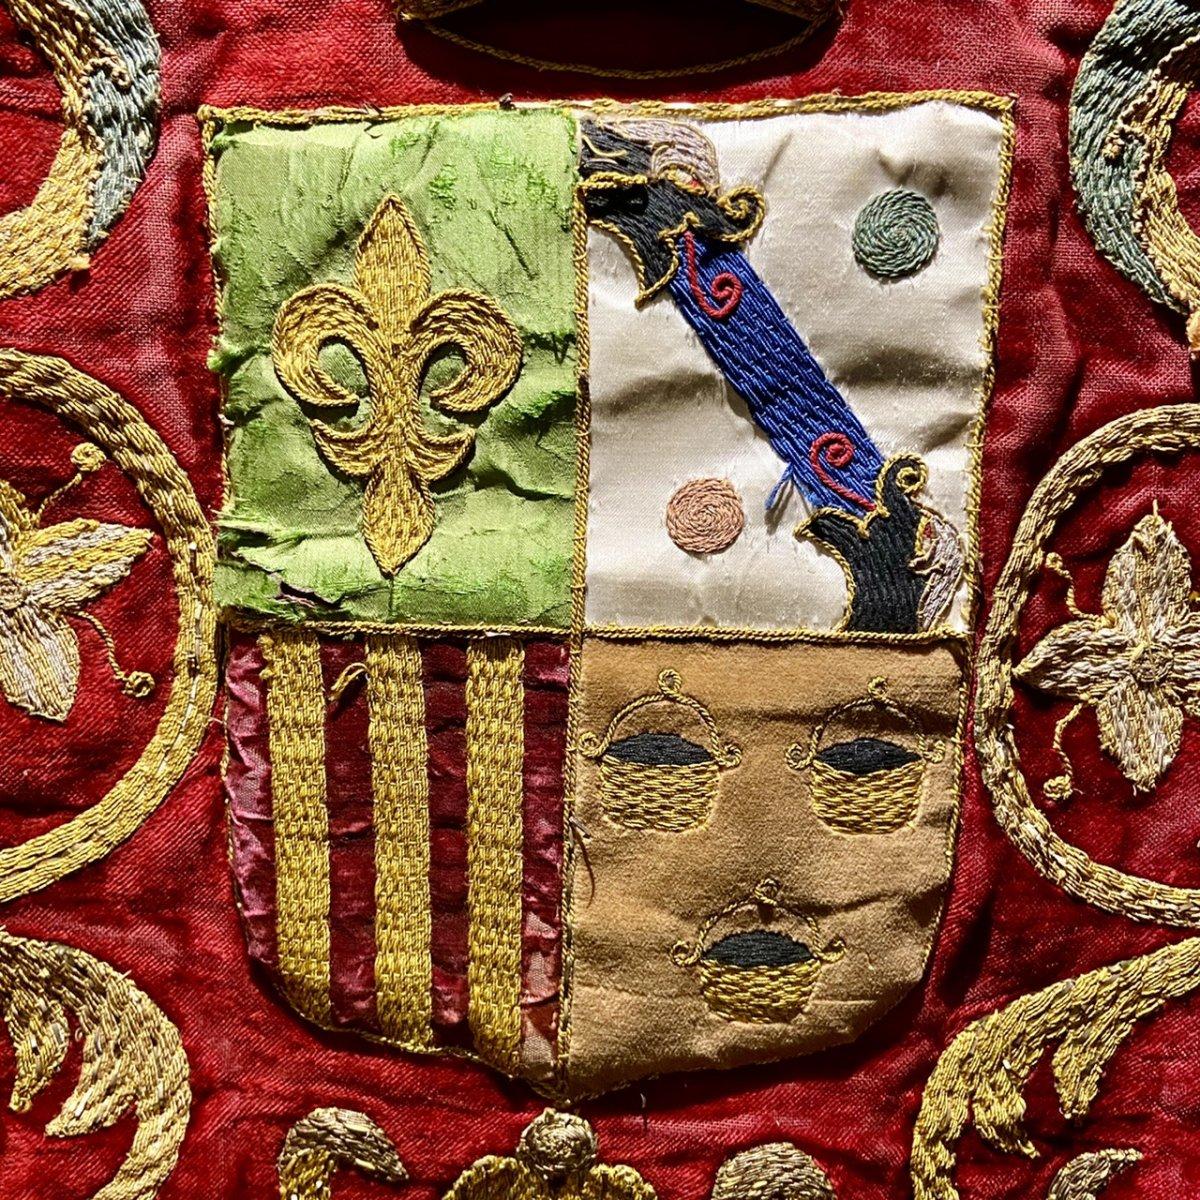 Armoiries Brodées XVIIIe Siècle